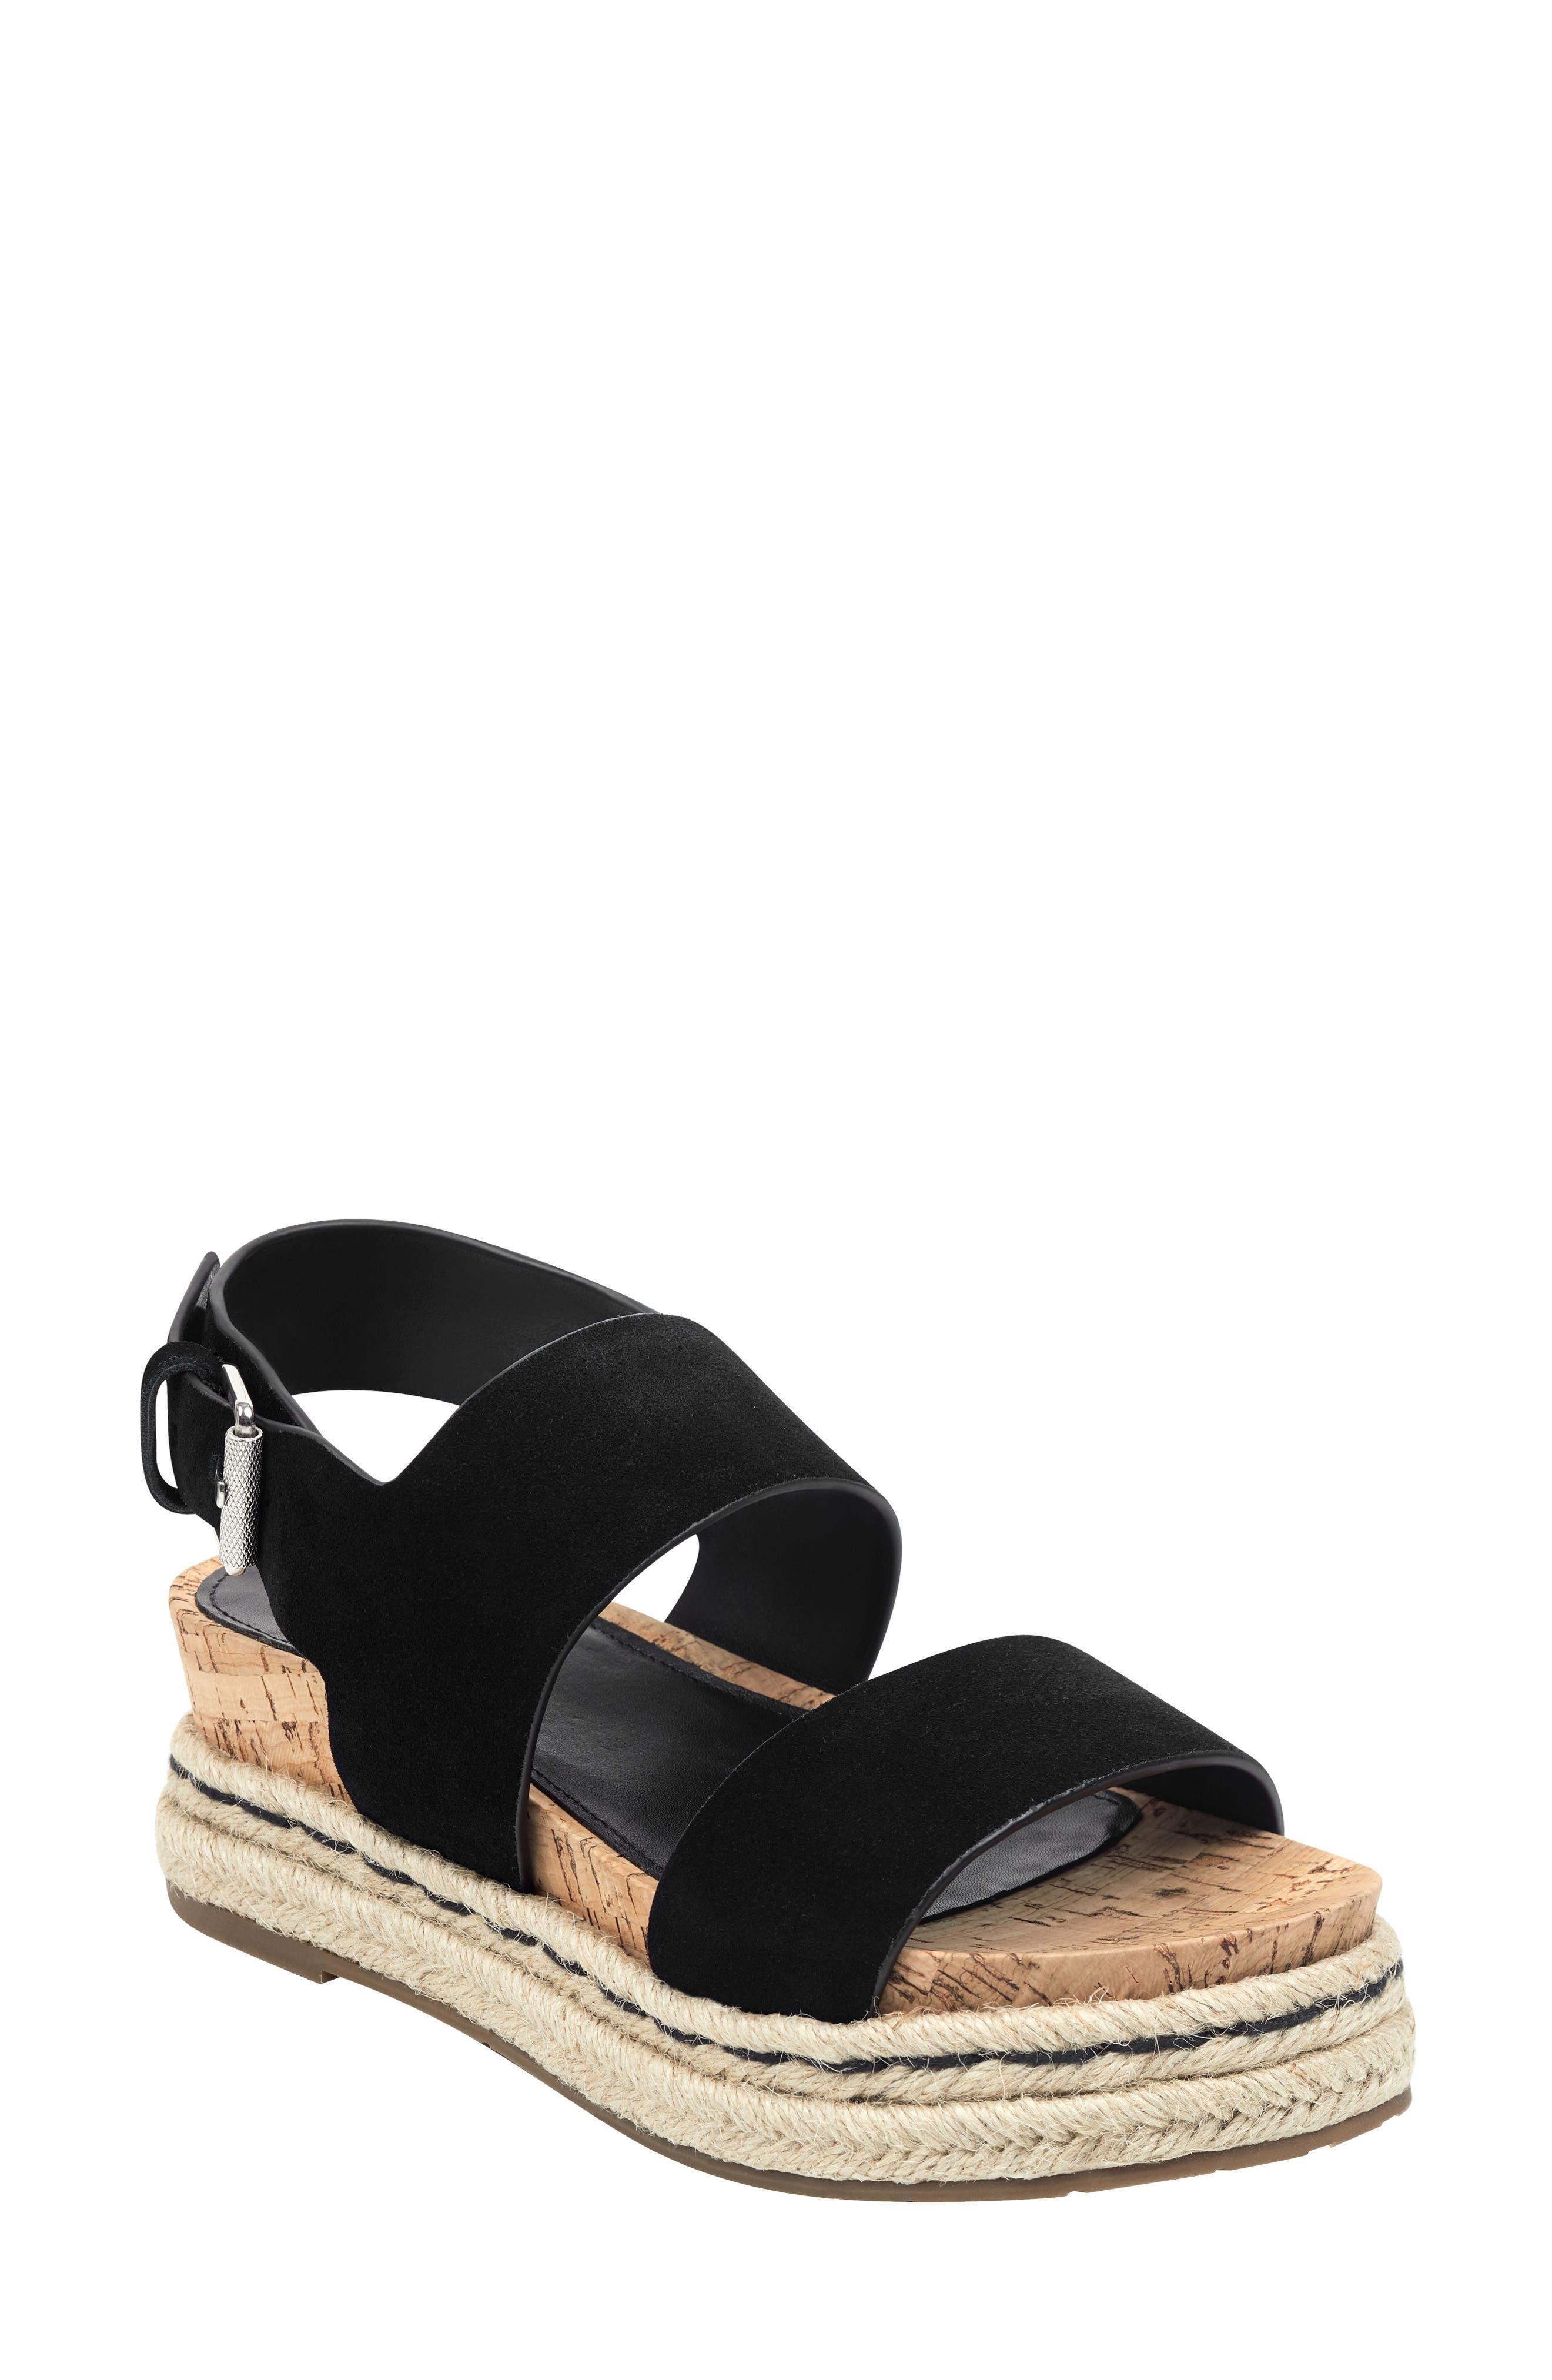 MARC FISHER LTD Oria Espadrille Platform Sandal, Main, color, BLACK SUEDE